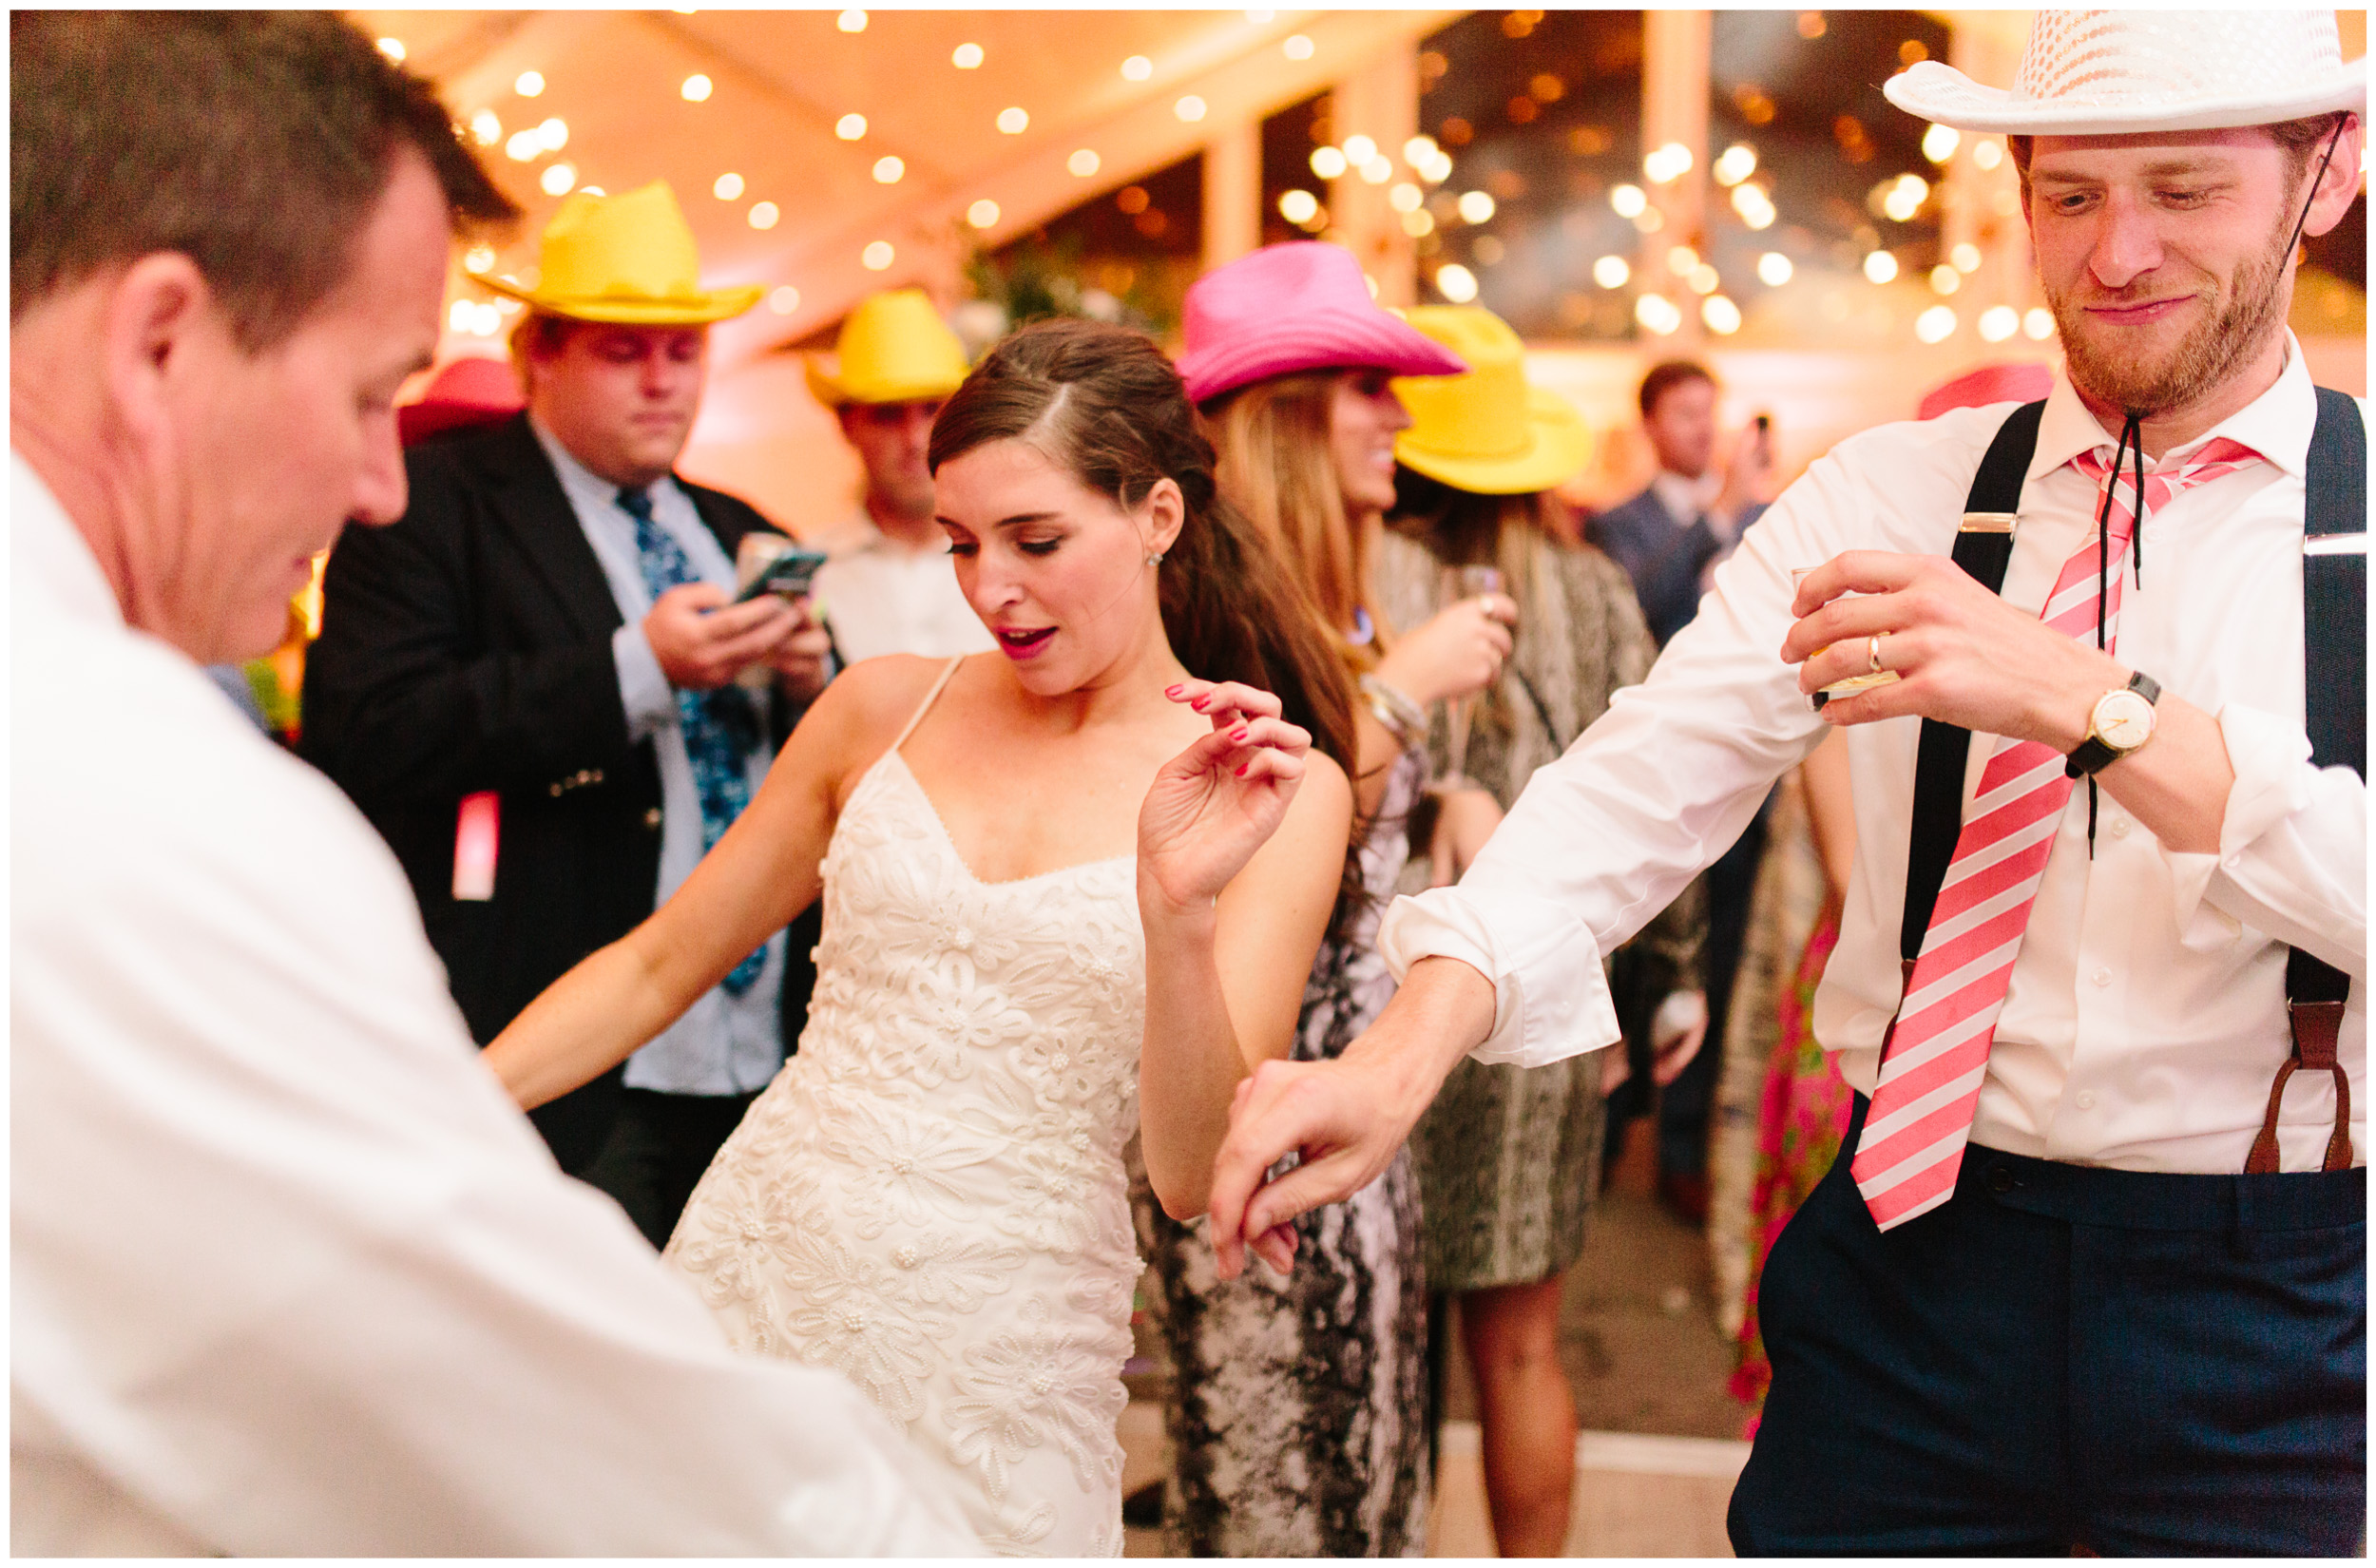 crested_butte_wedding_130.jpg